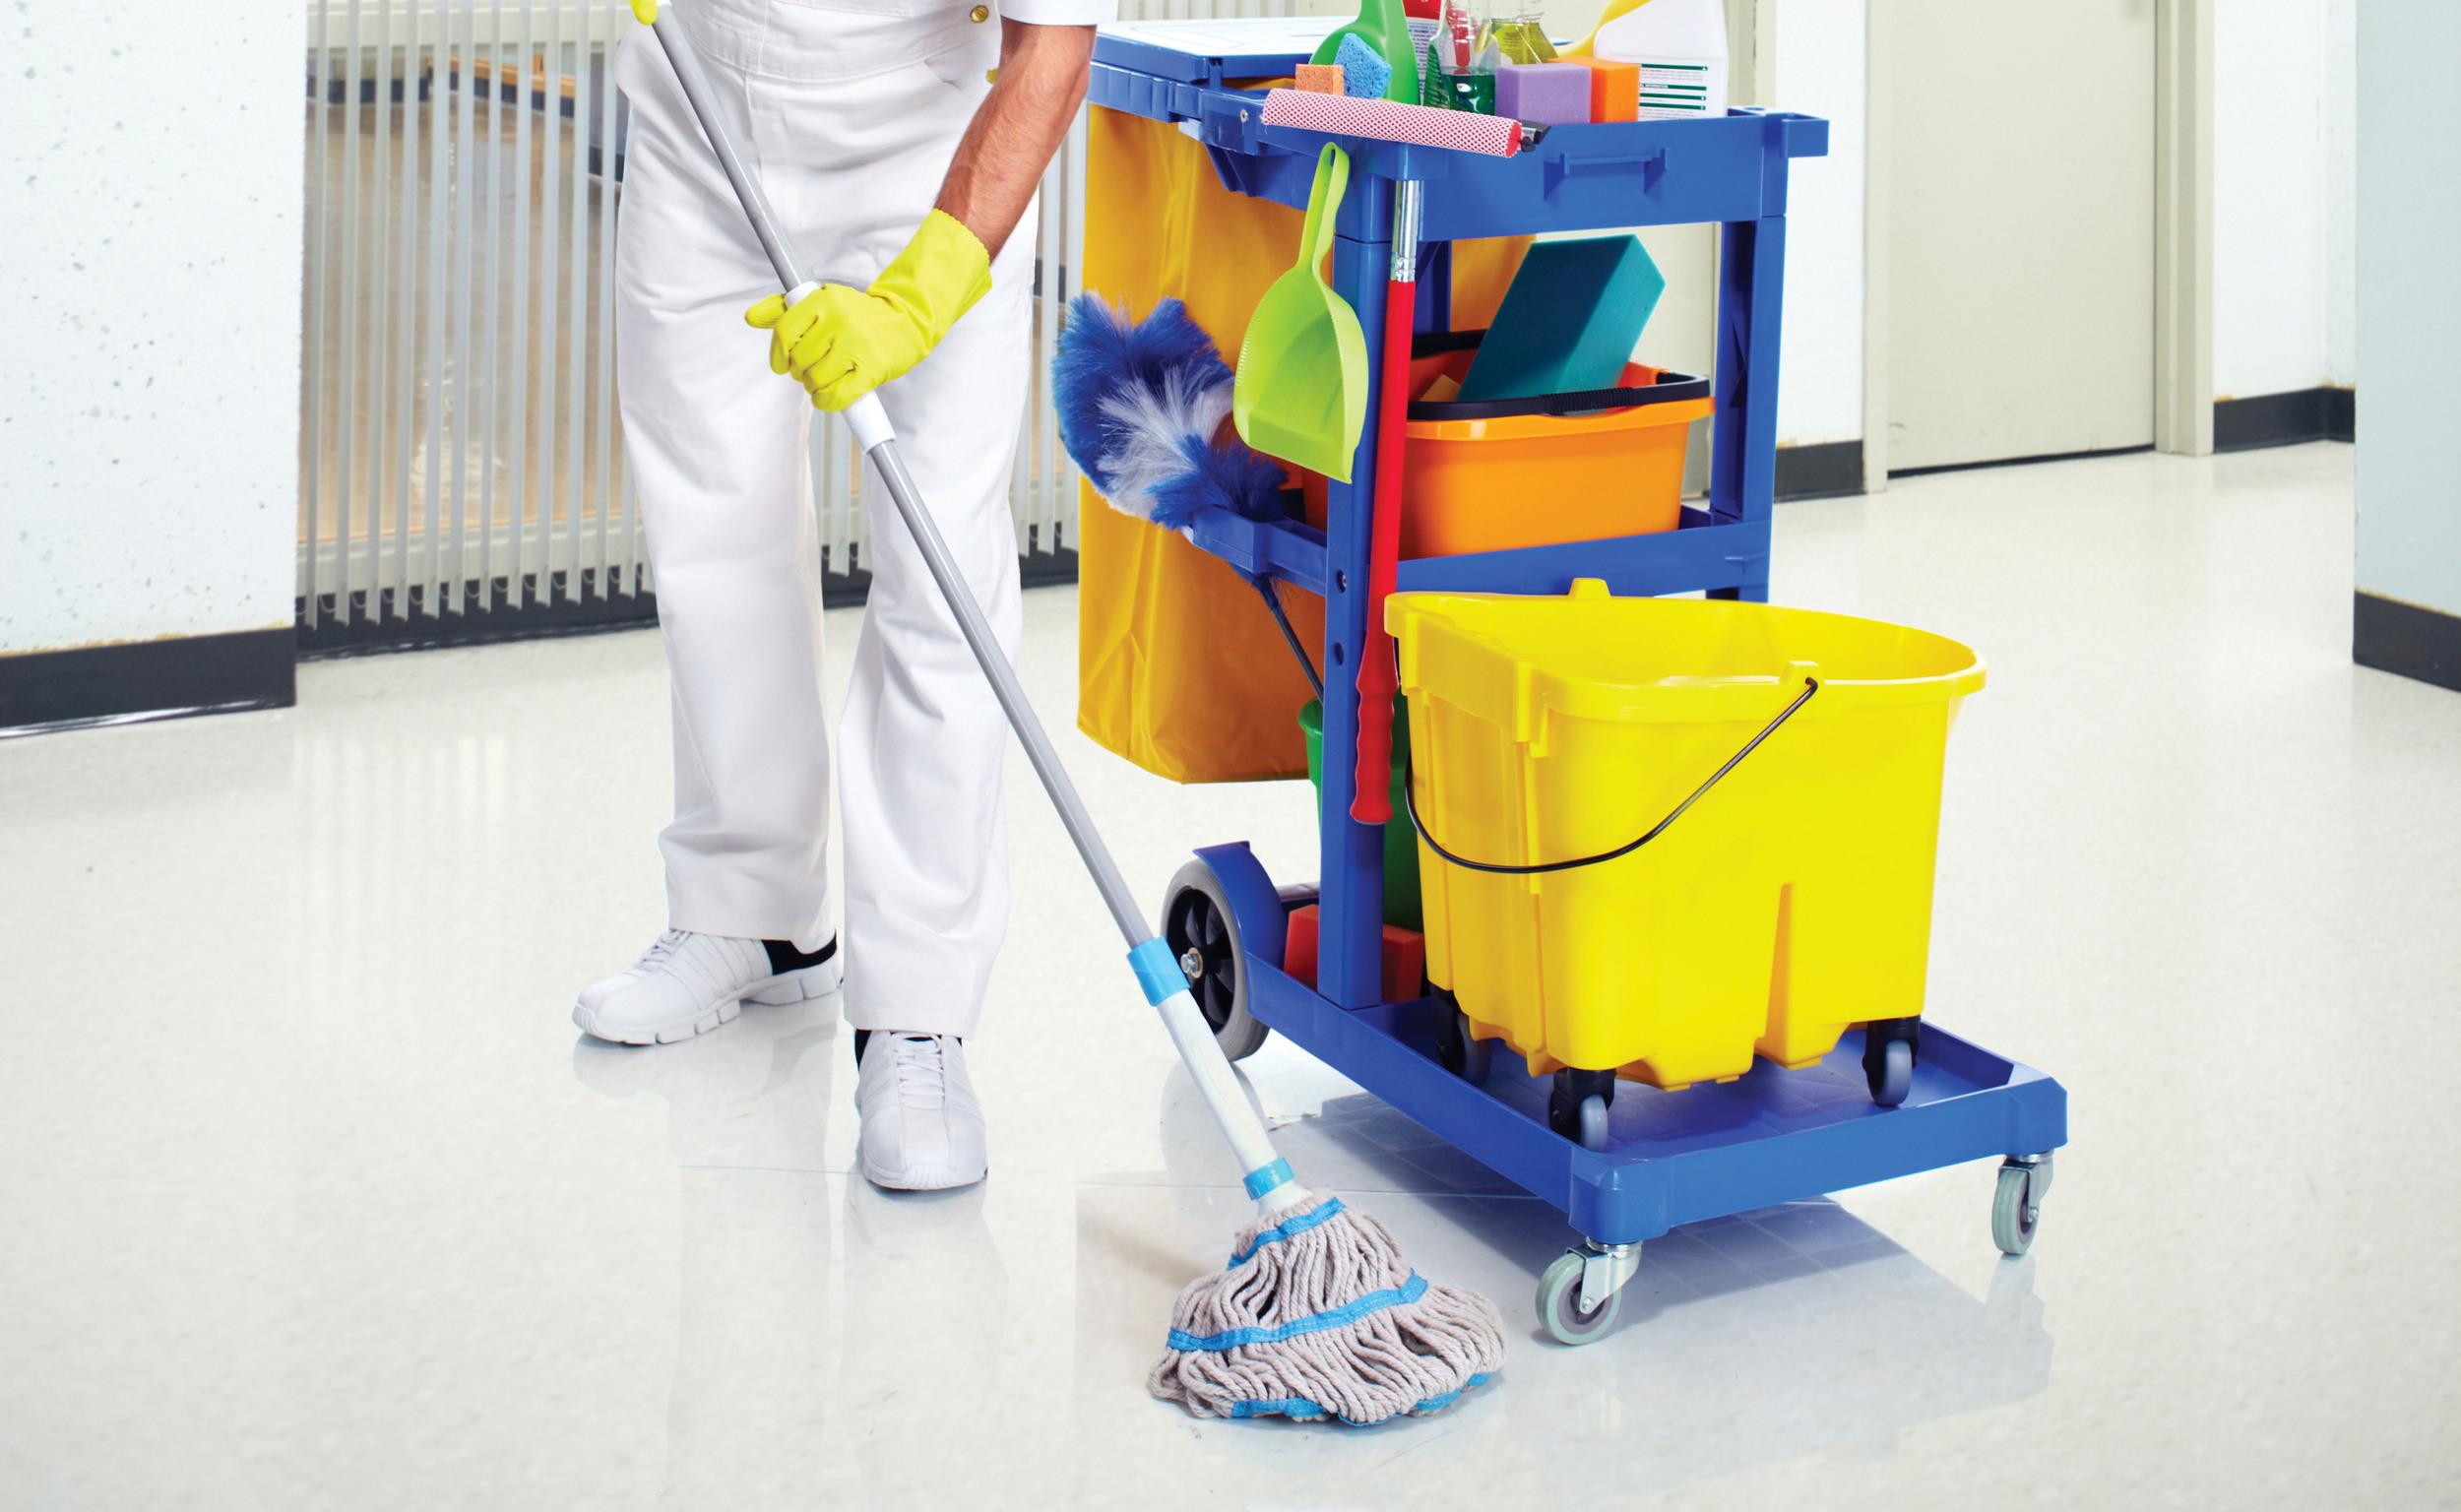 janitor-cart.jpg